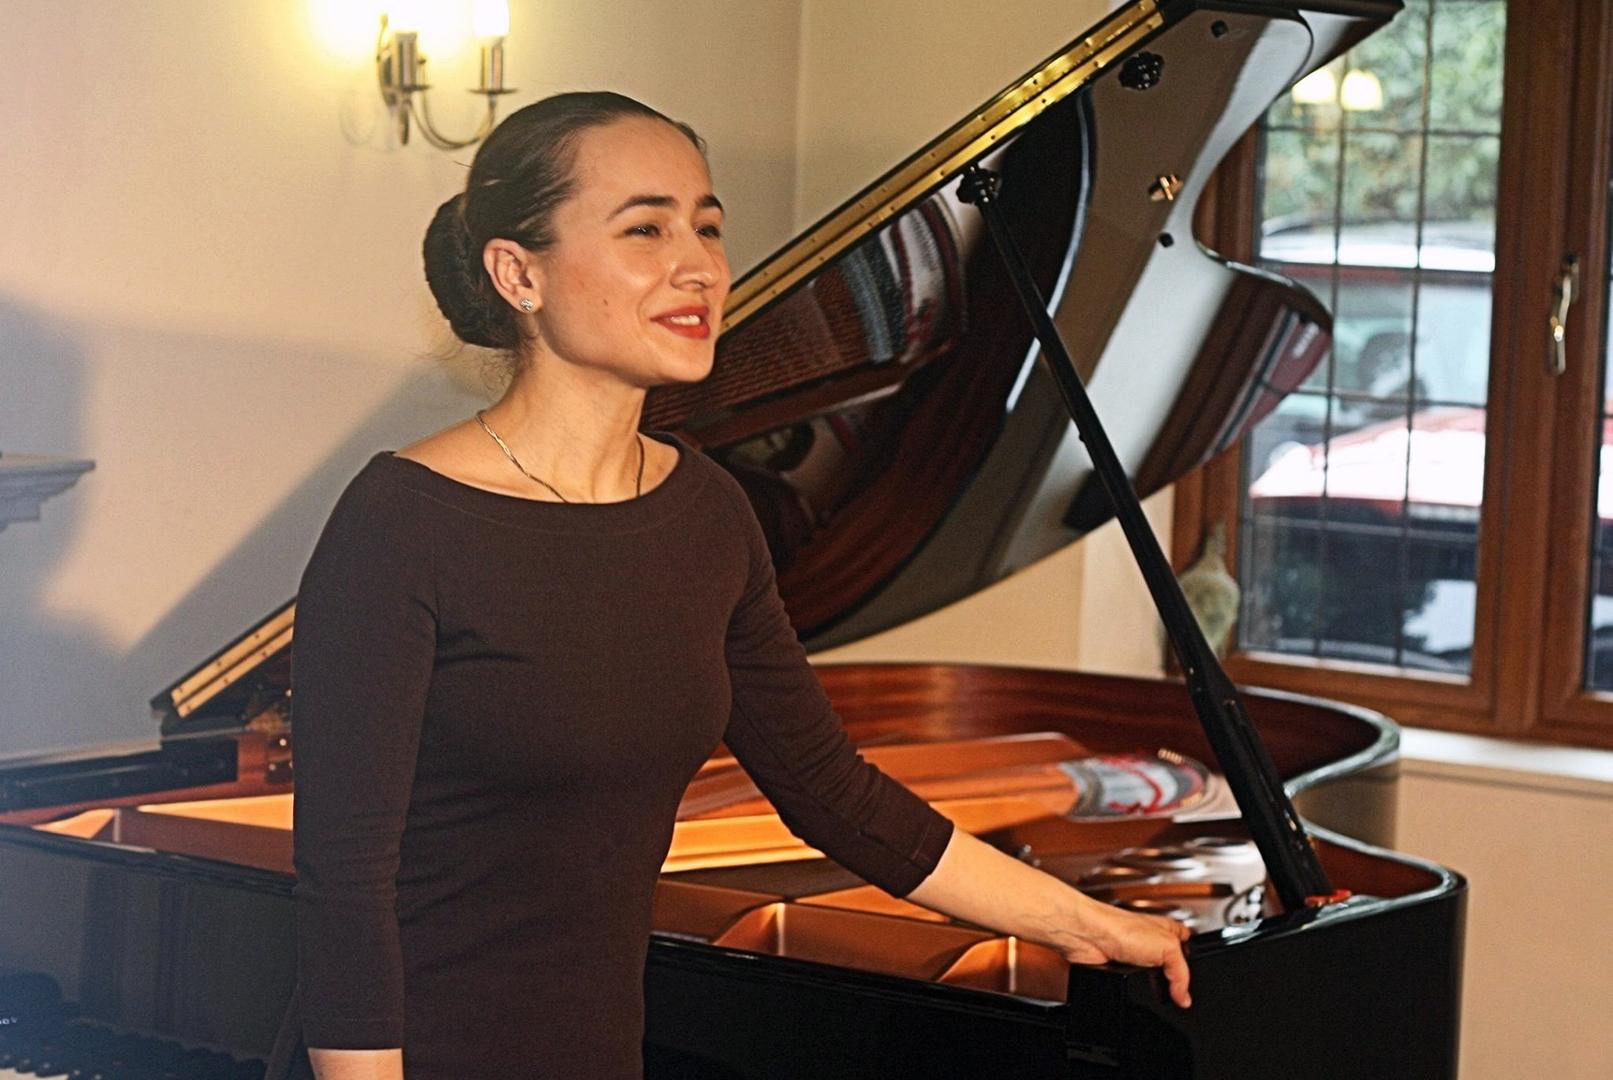 Anna Tsybuleva at Breinton